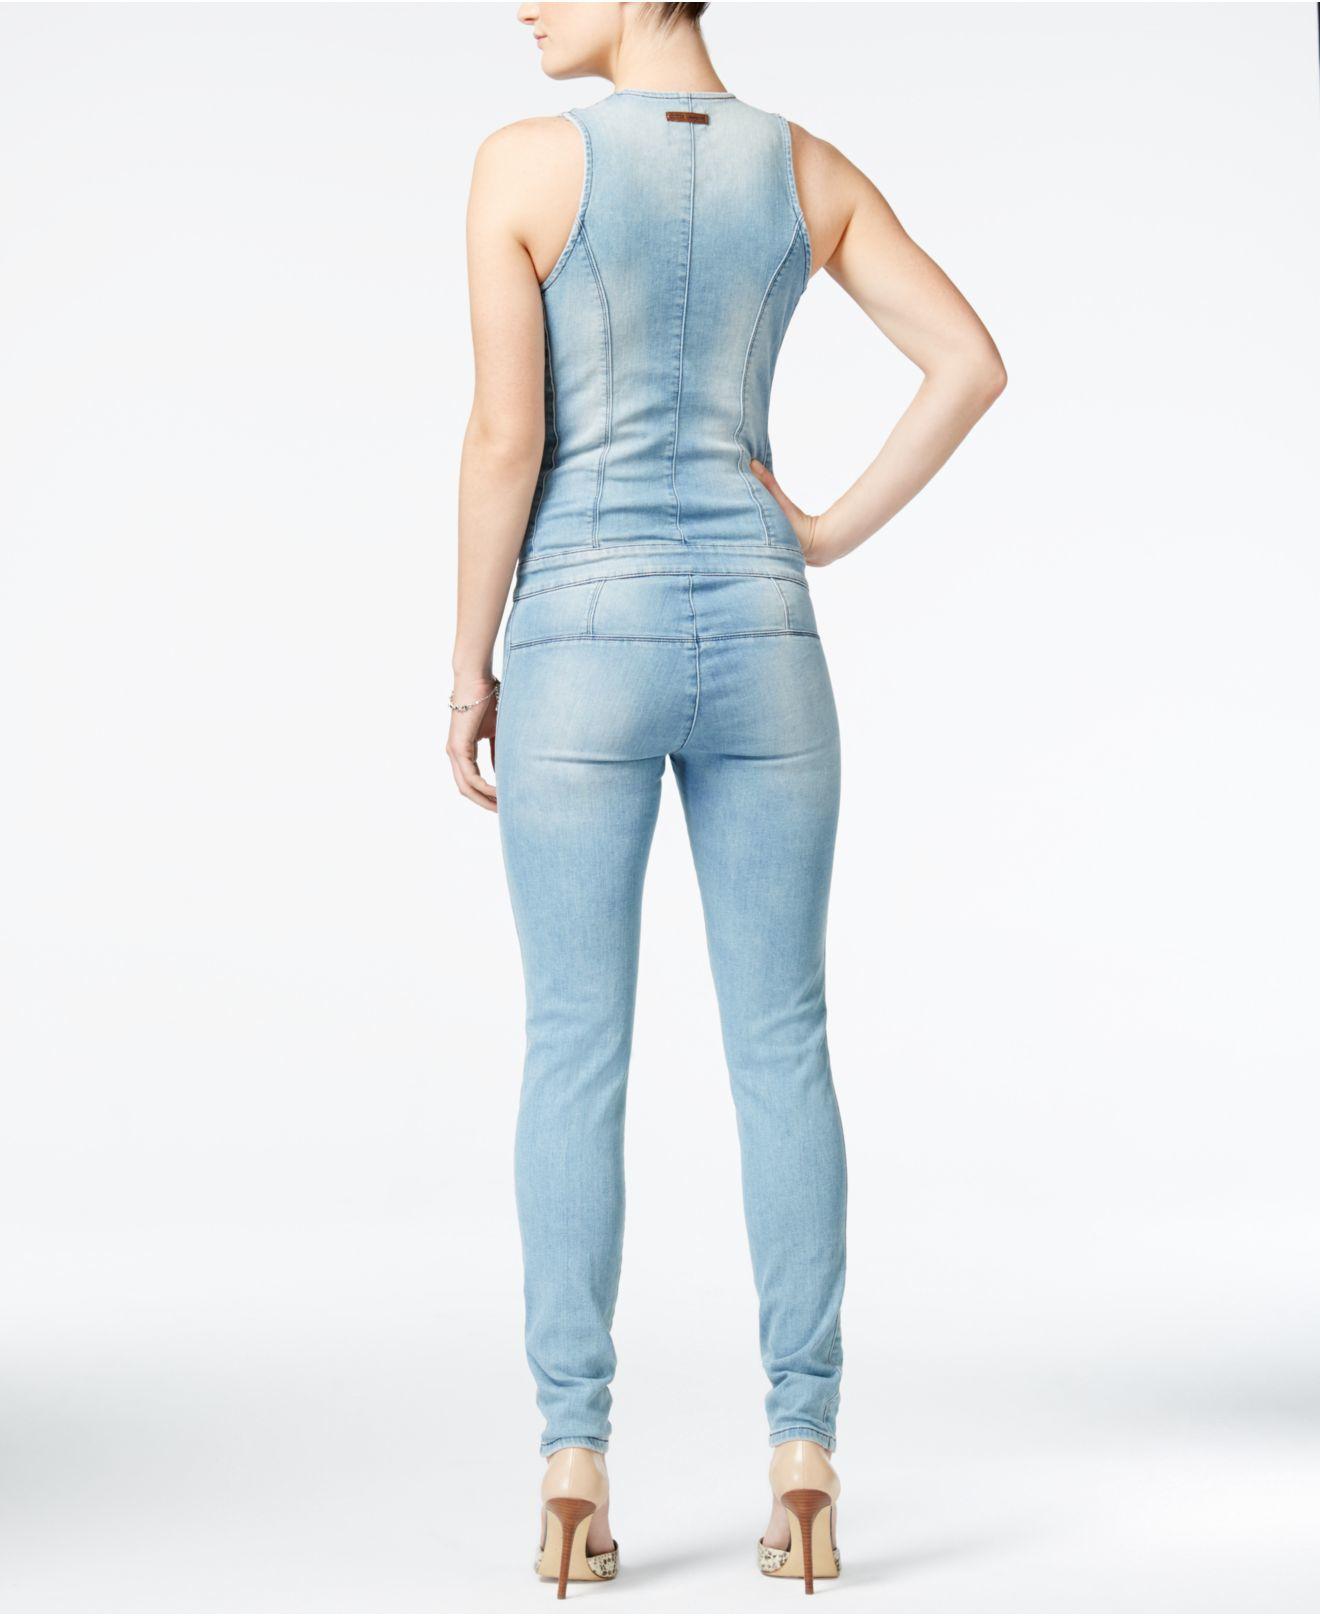 cf23e392bde8 Lyst - Guess Ripped Denim Zip-up Jumpsuit in Blue